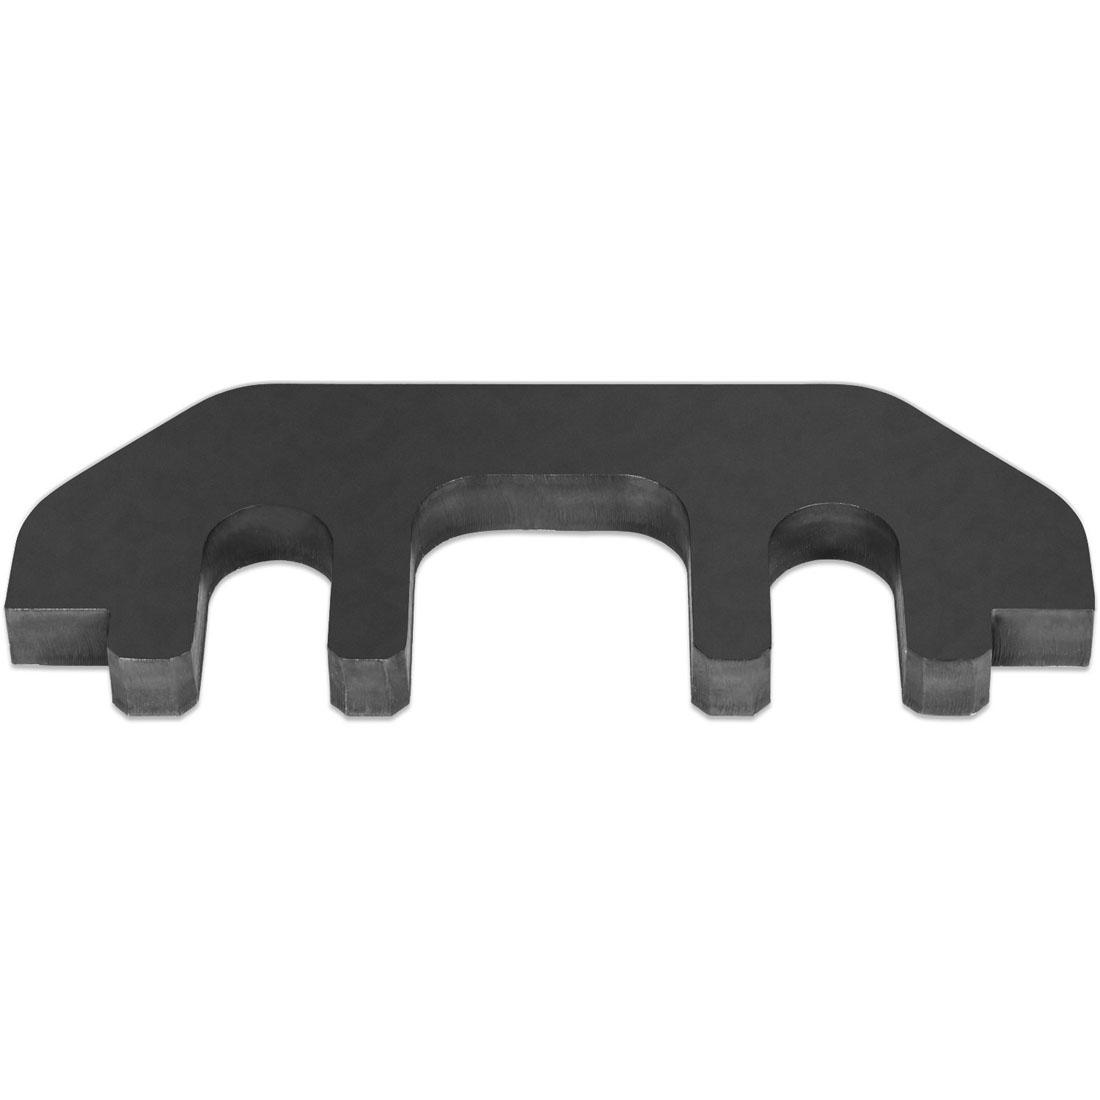 2 Premium Tie Rod Assemblies for 04-11 Nissan Armada Pathfinder Infiniti QX56